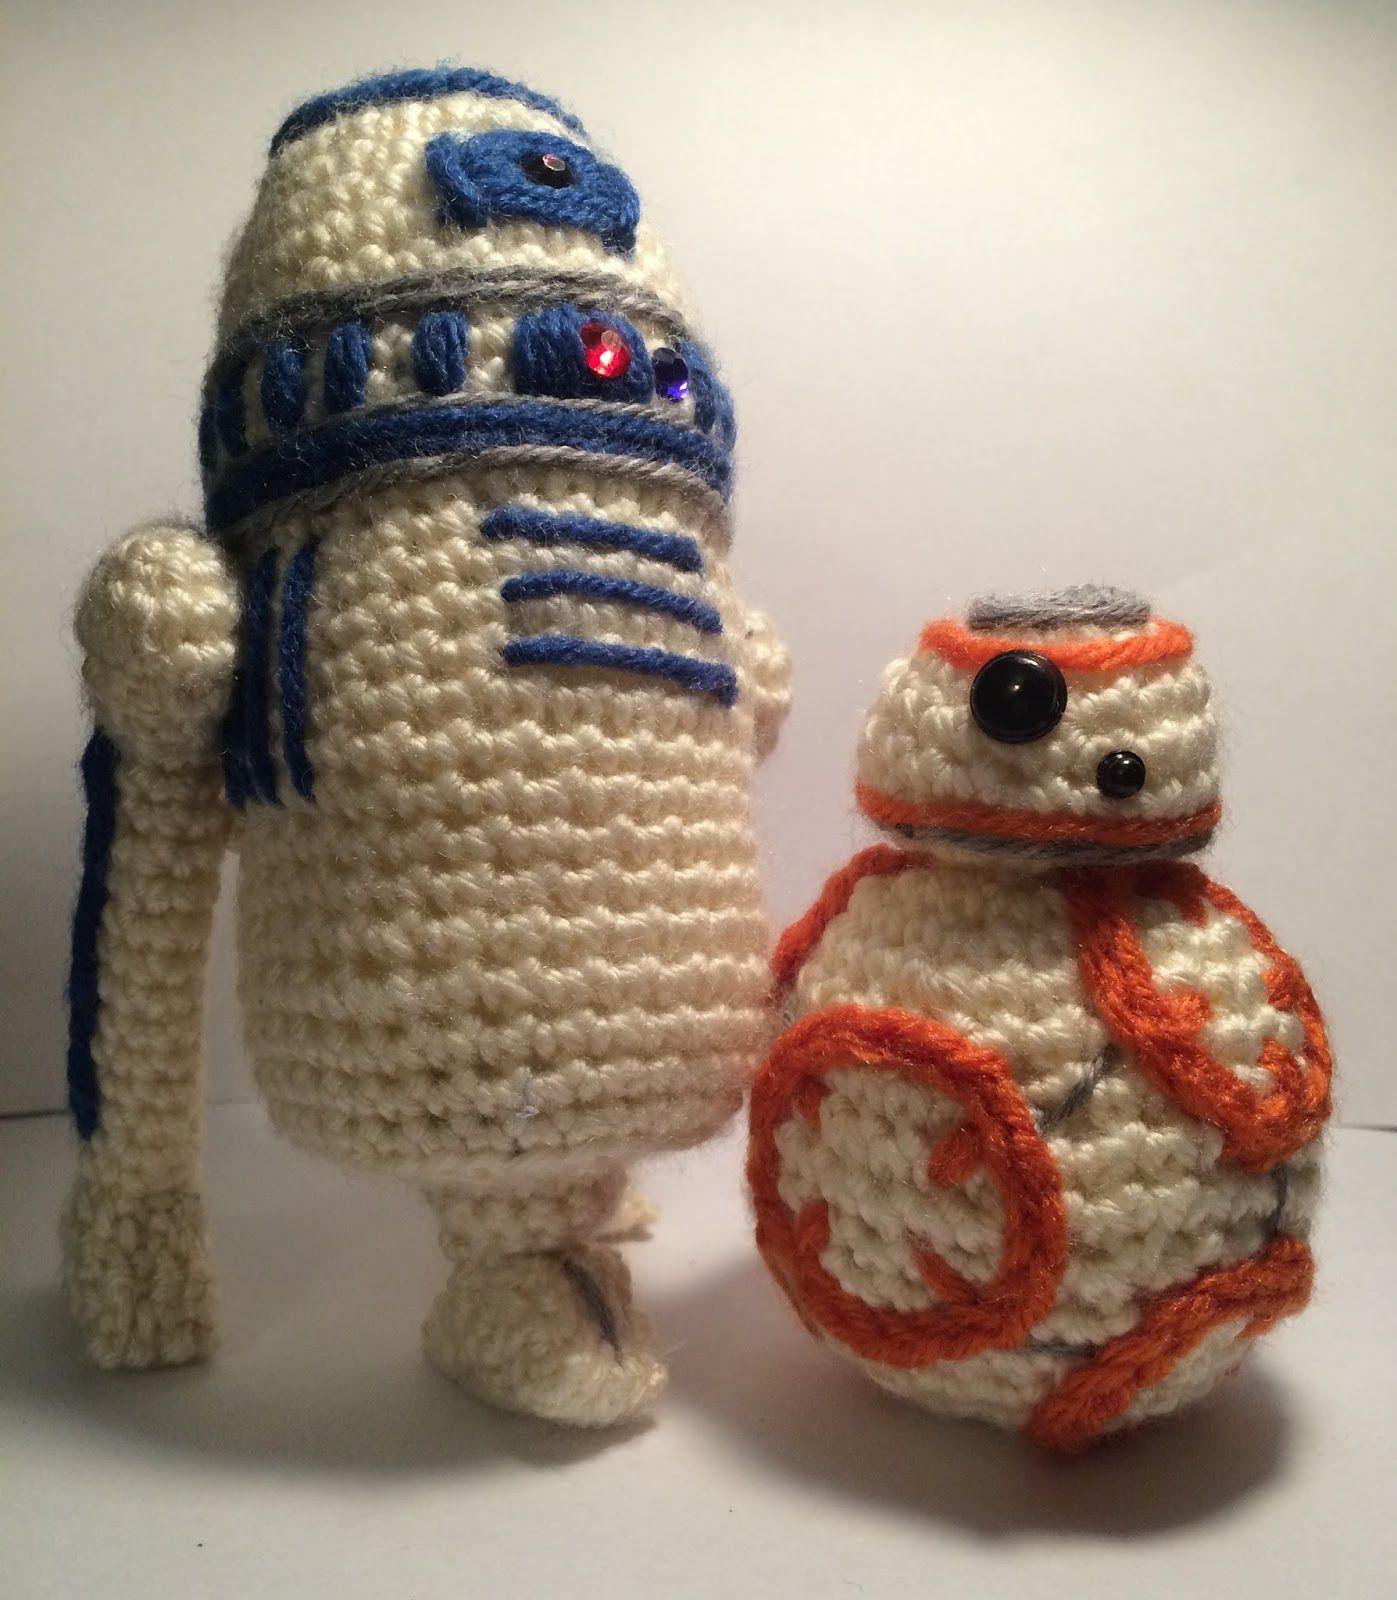 Star wars r2 d2 and bb 8 free crochet patterns simply hooked my star wars r2 d2 and bb 8 free crochet patterns simply hooked bankloansurffo Images